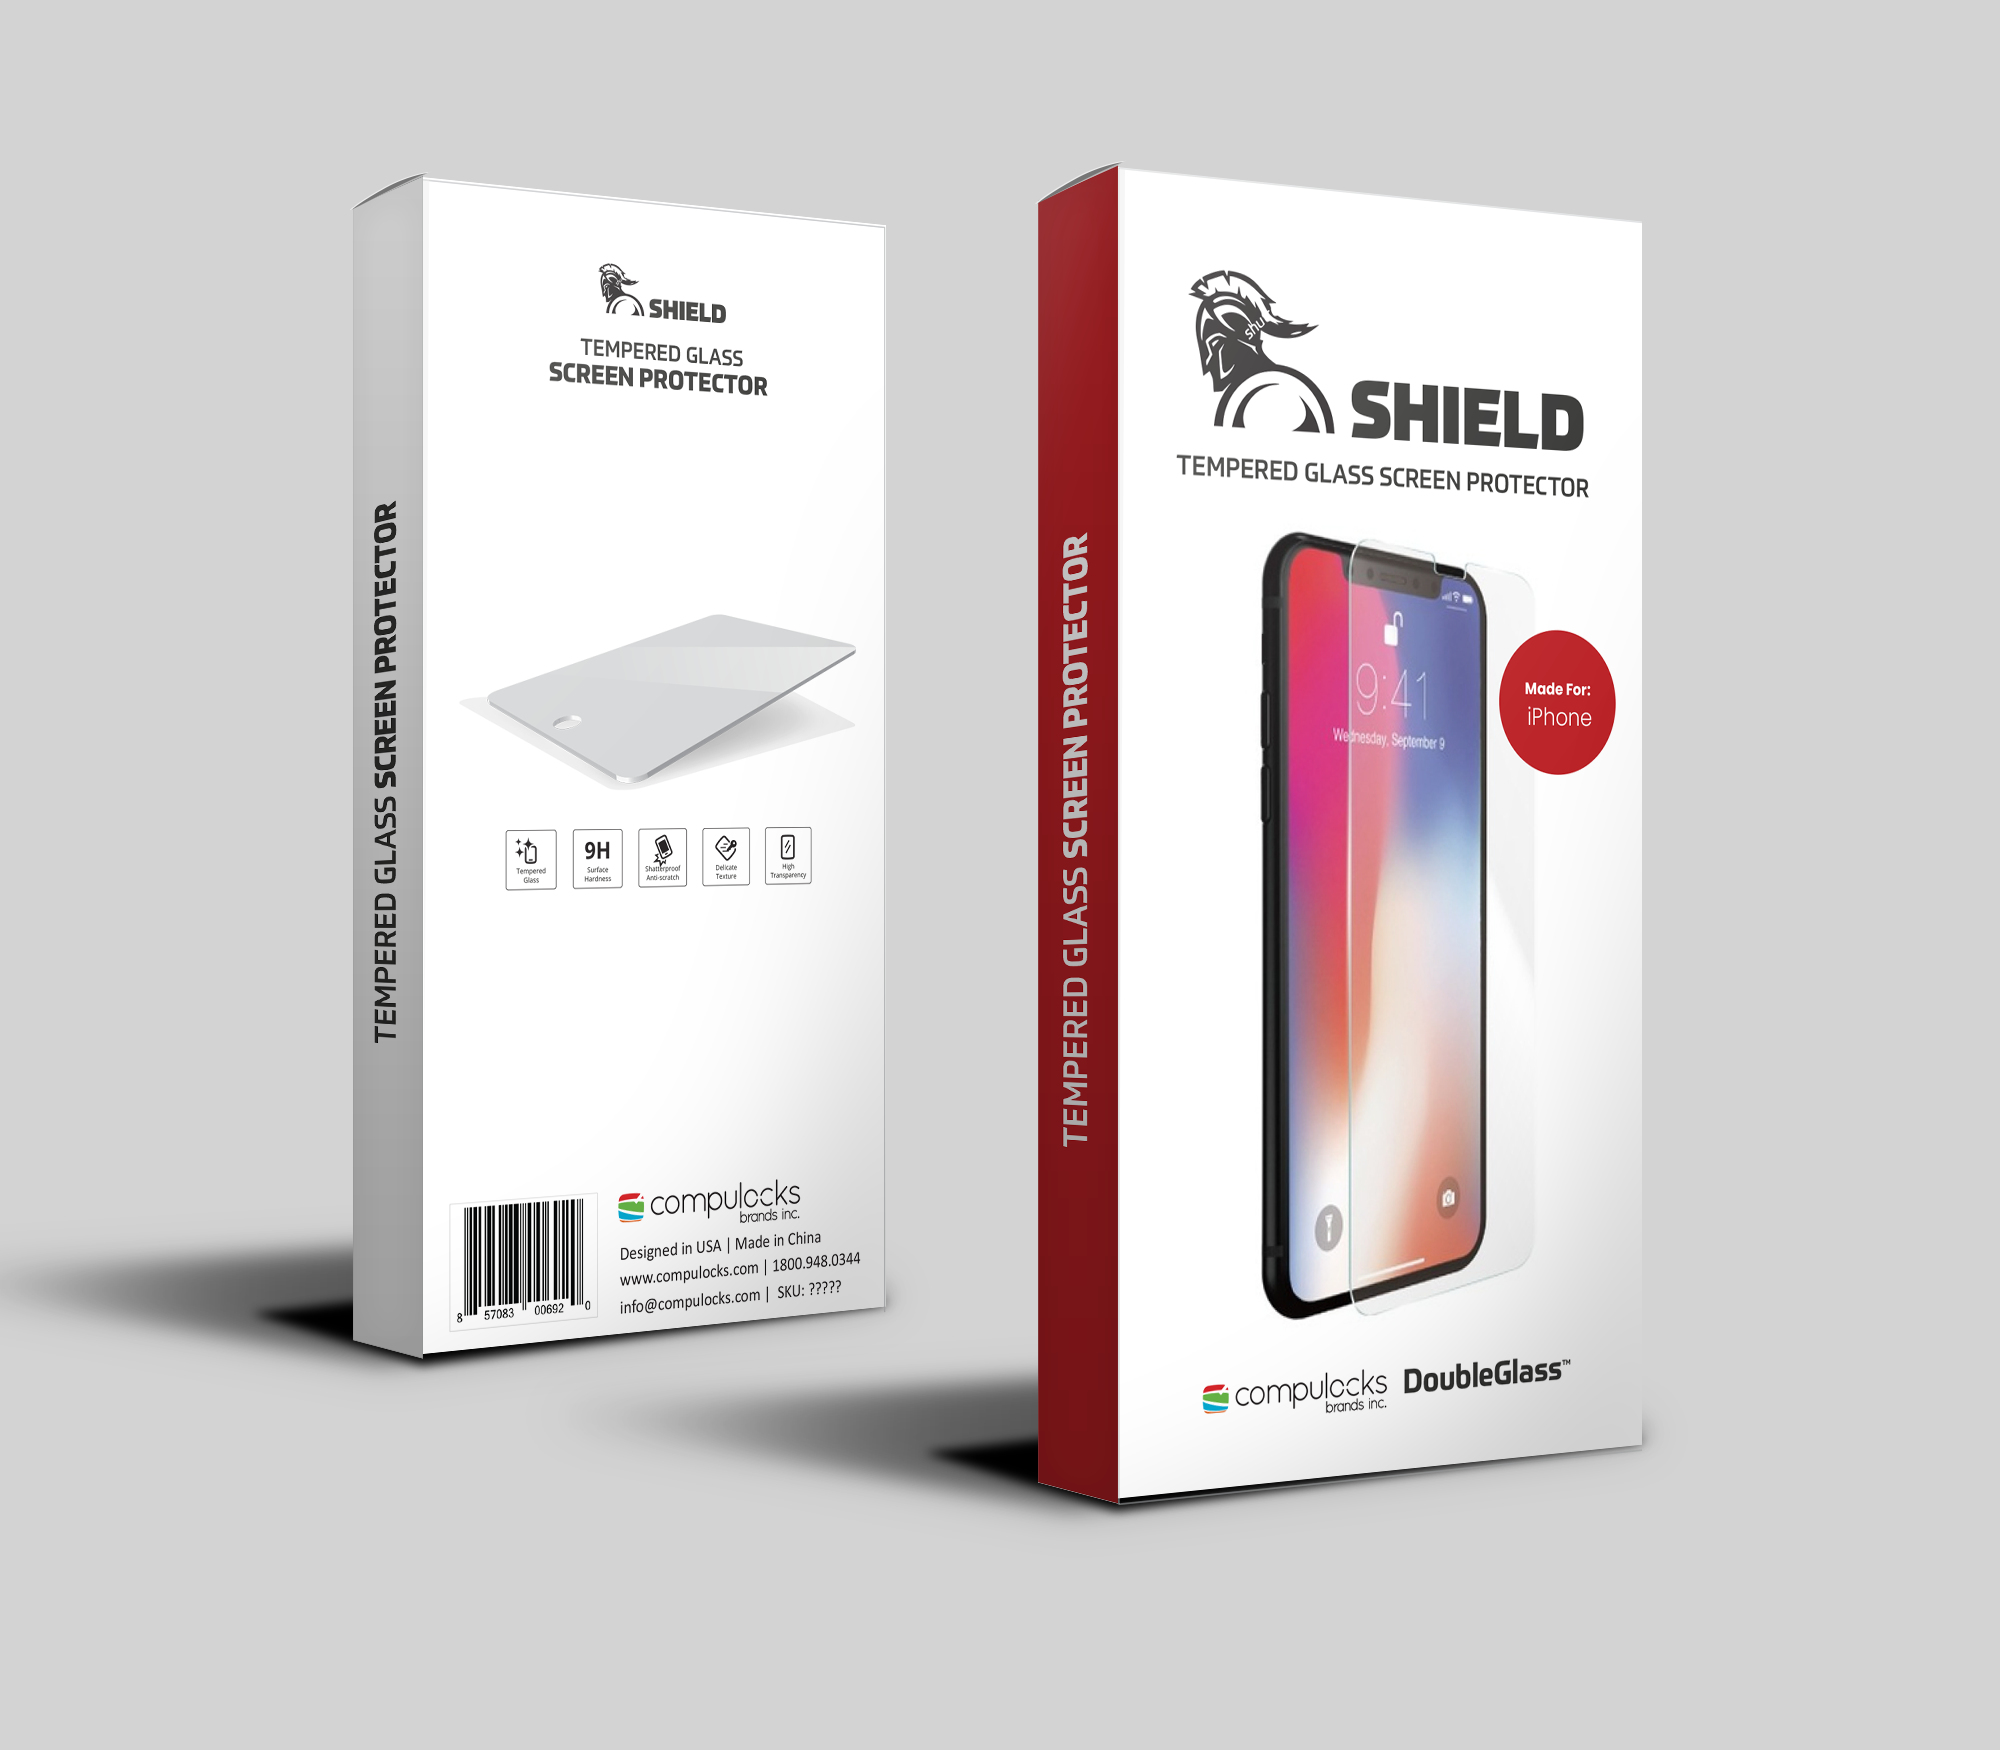 Compulocks DoubleGlass Screen Shield Teléfono móvil/smartphone Apple 1 pieza(s)